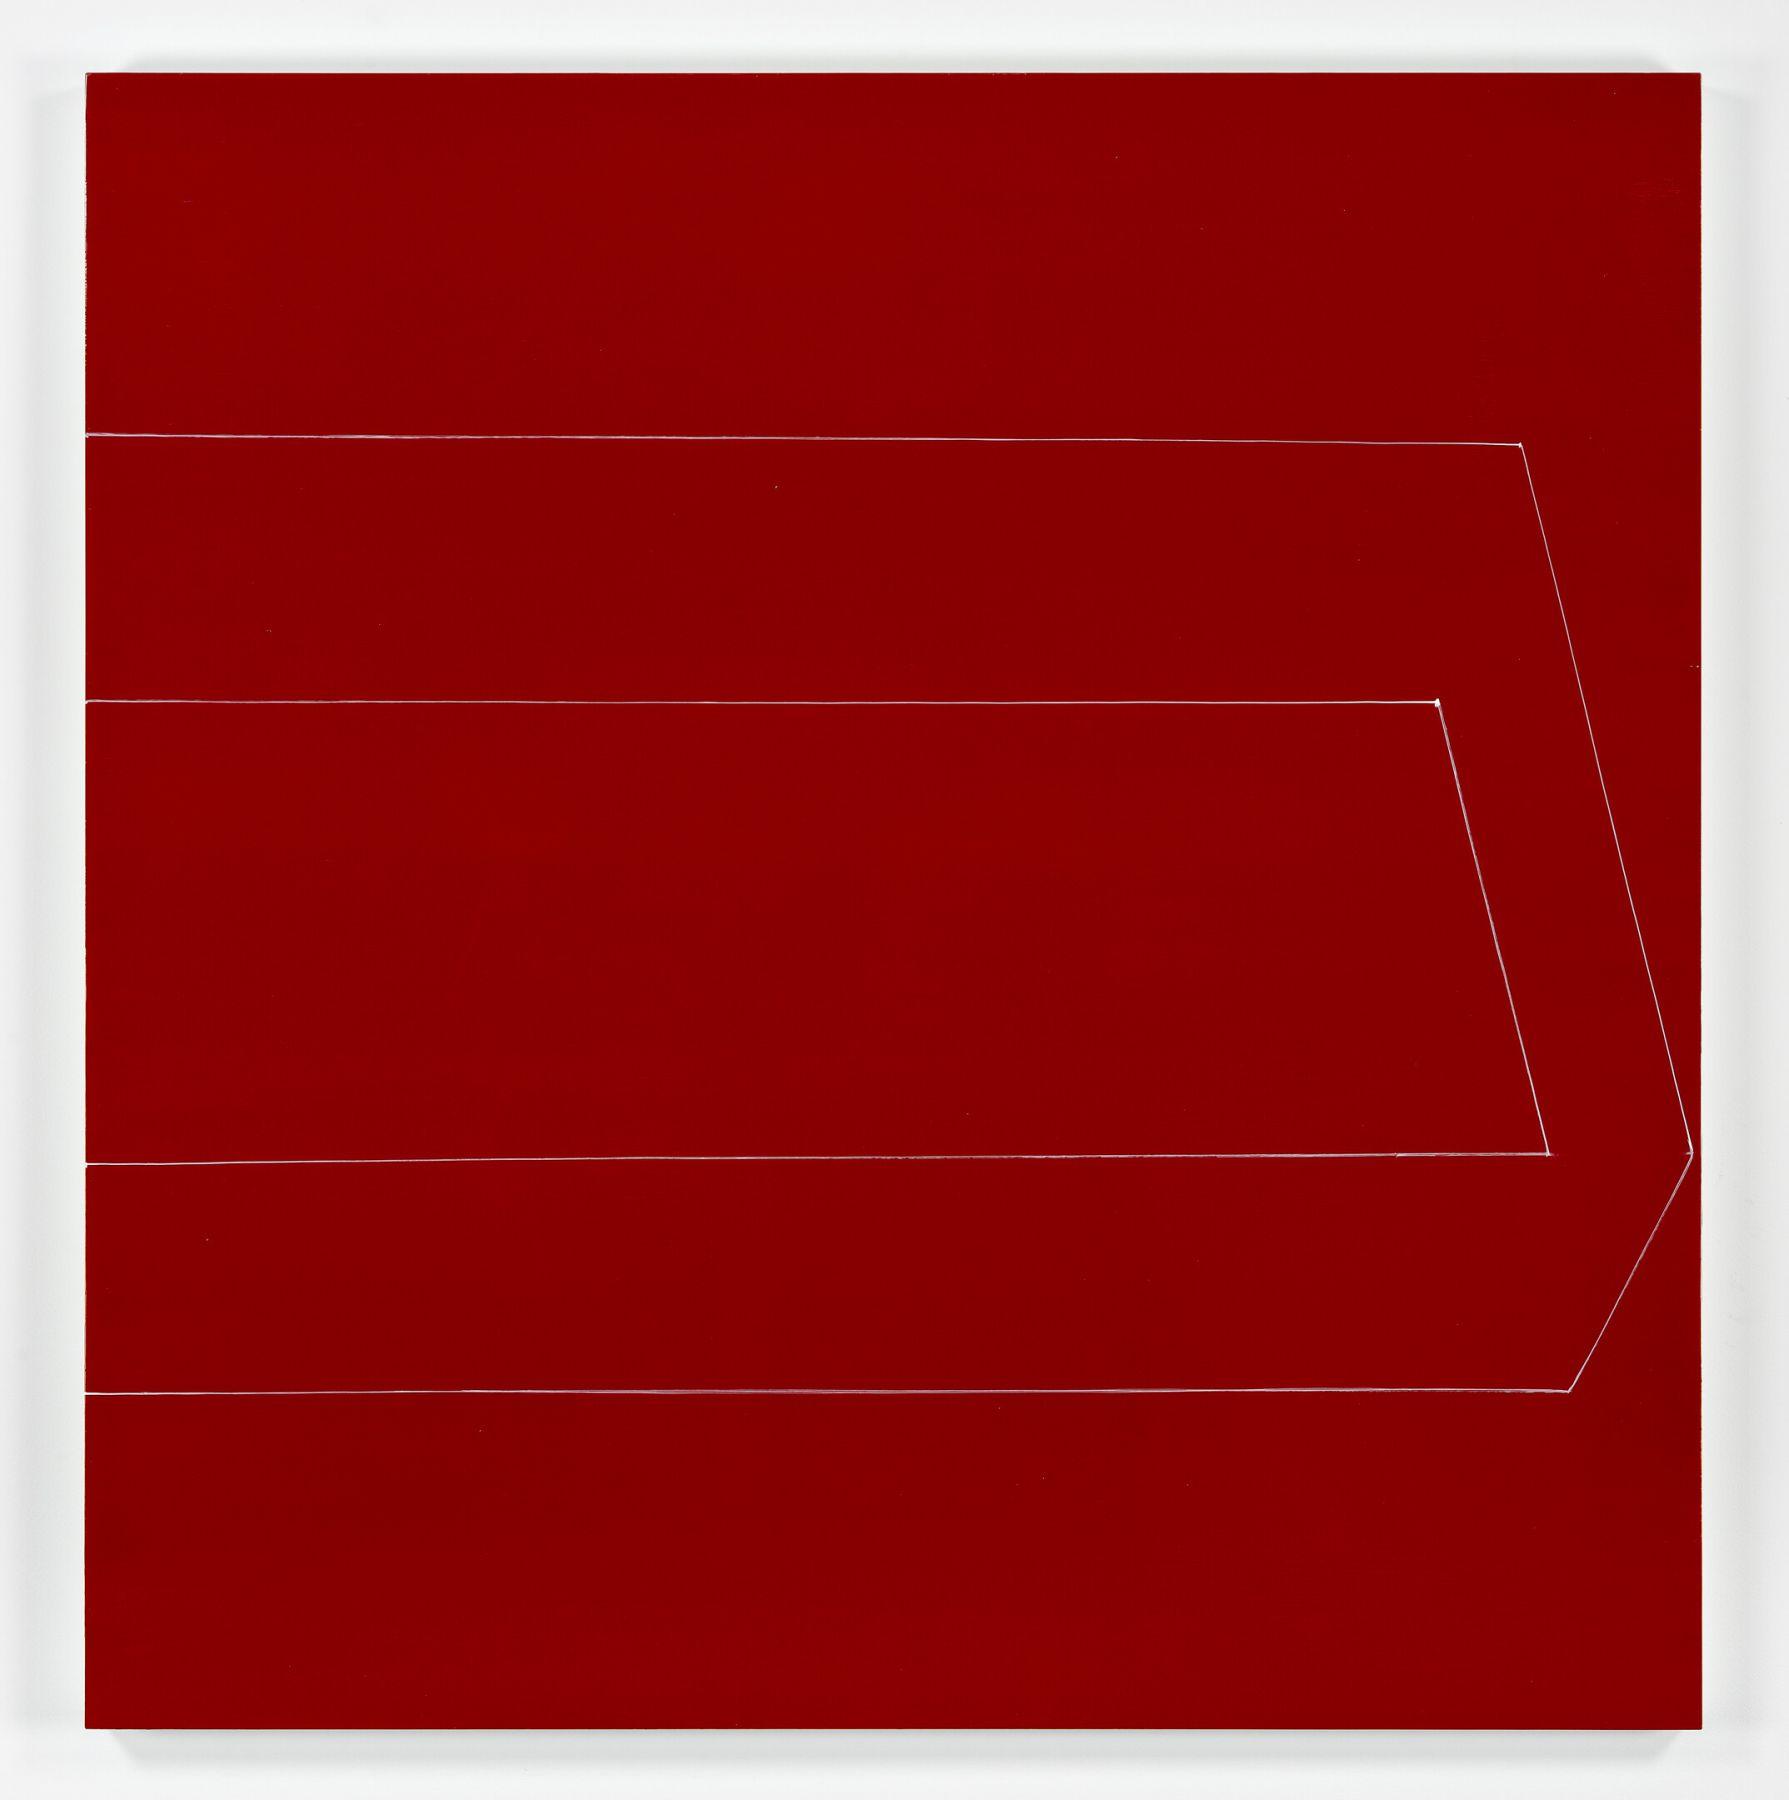 Kate Shepherd, half box open eyed straight on red, 2019, Oil and enamel on panel